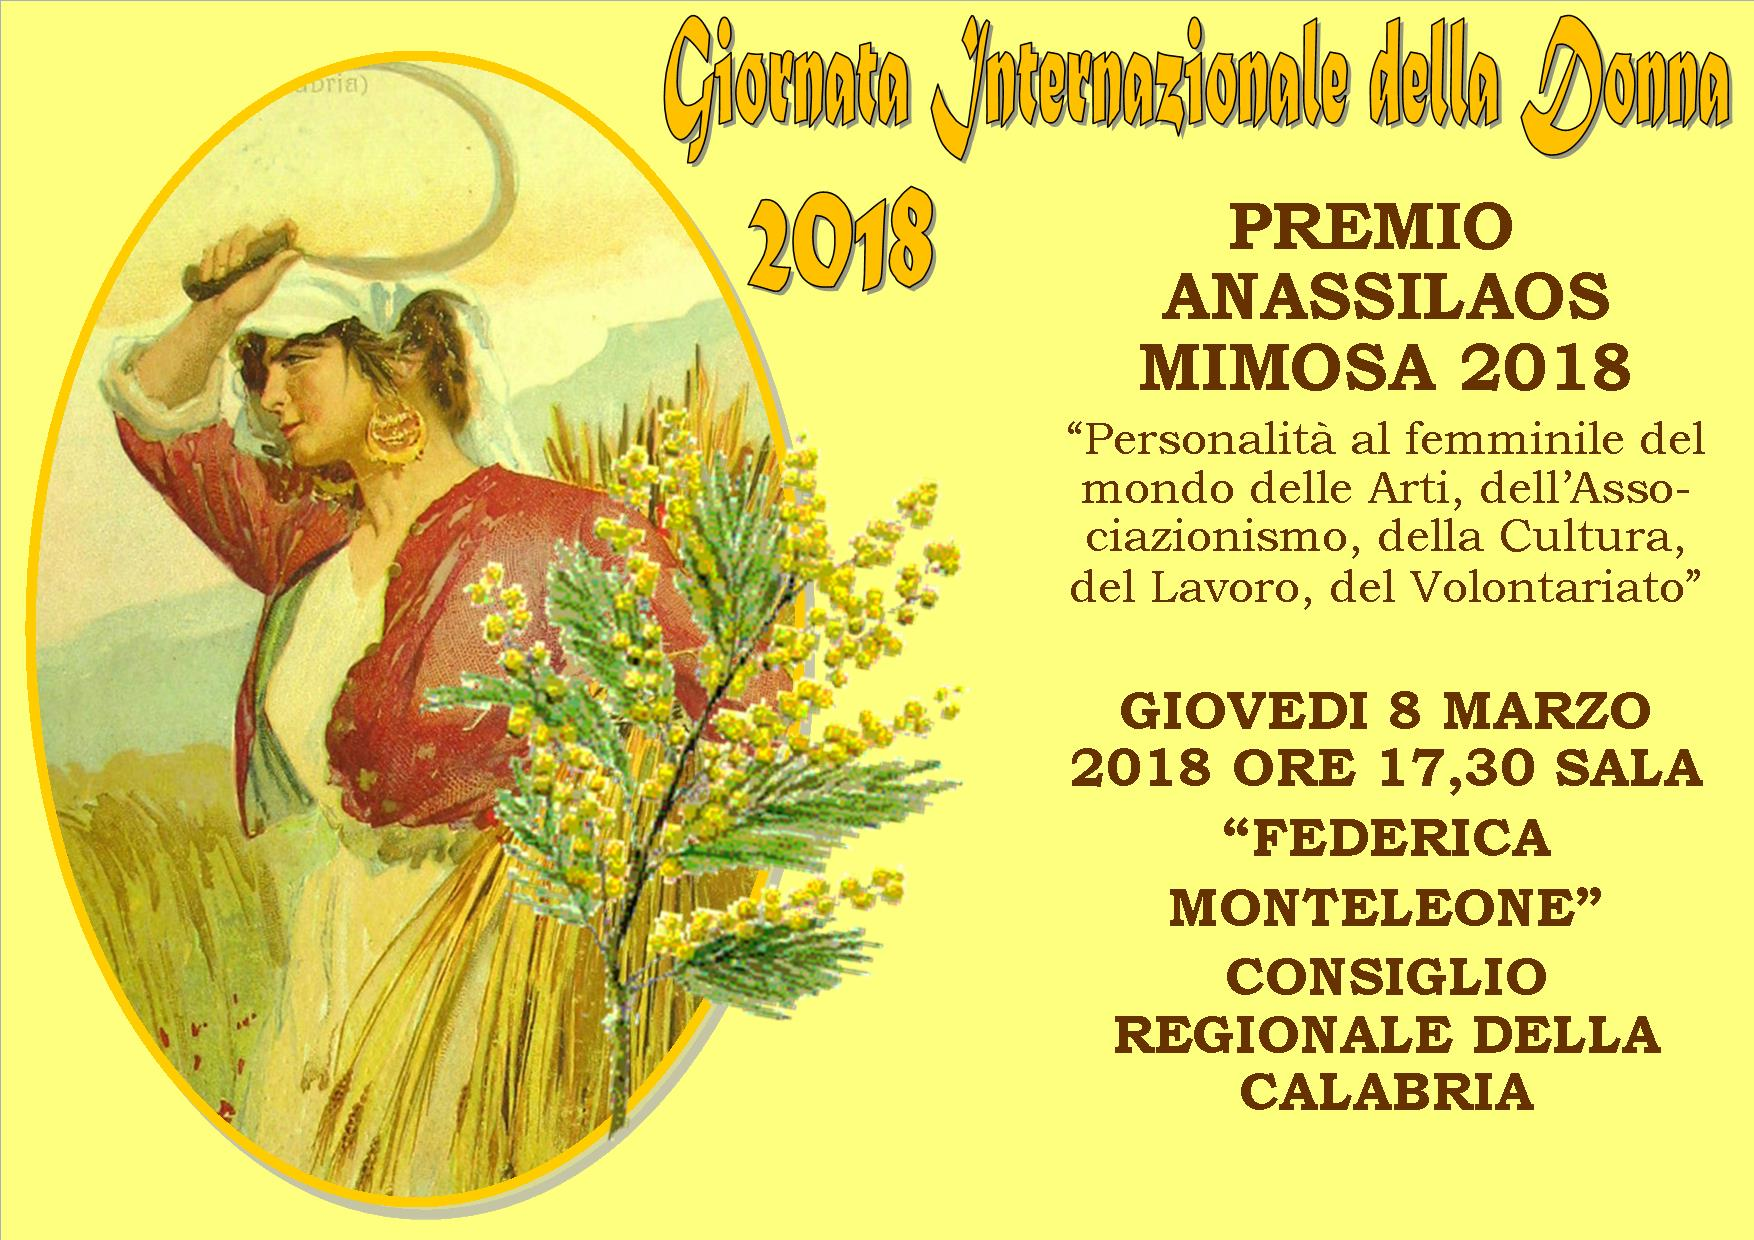 Premio Anassilaos Mimosa 2018 – Premio Anassilaos San Giorgio 2018